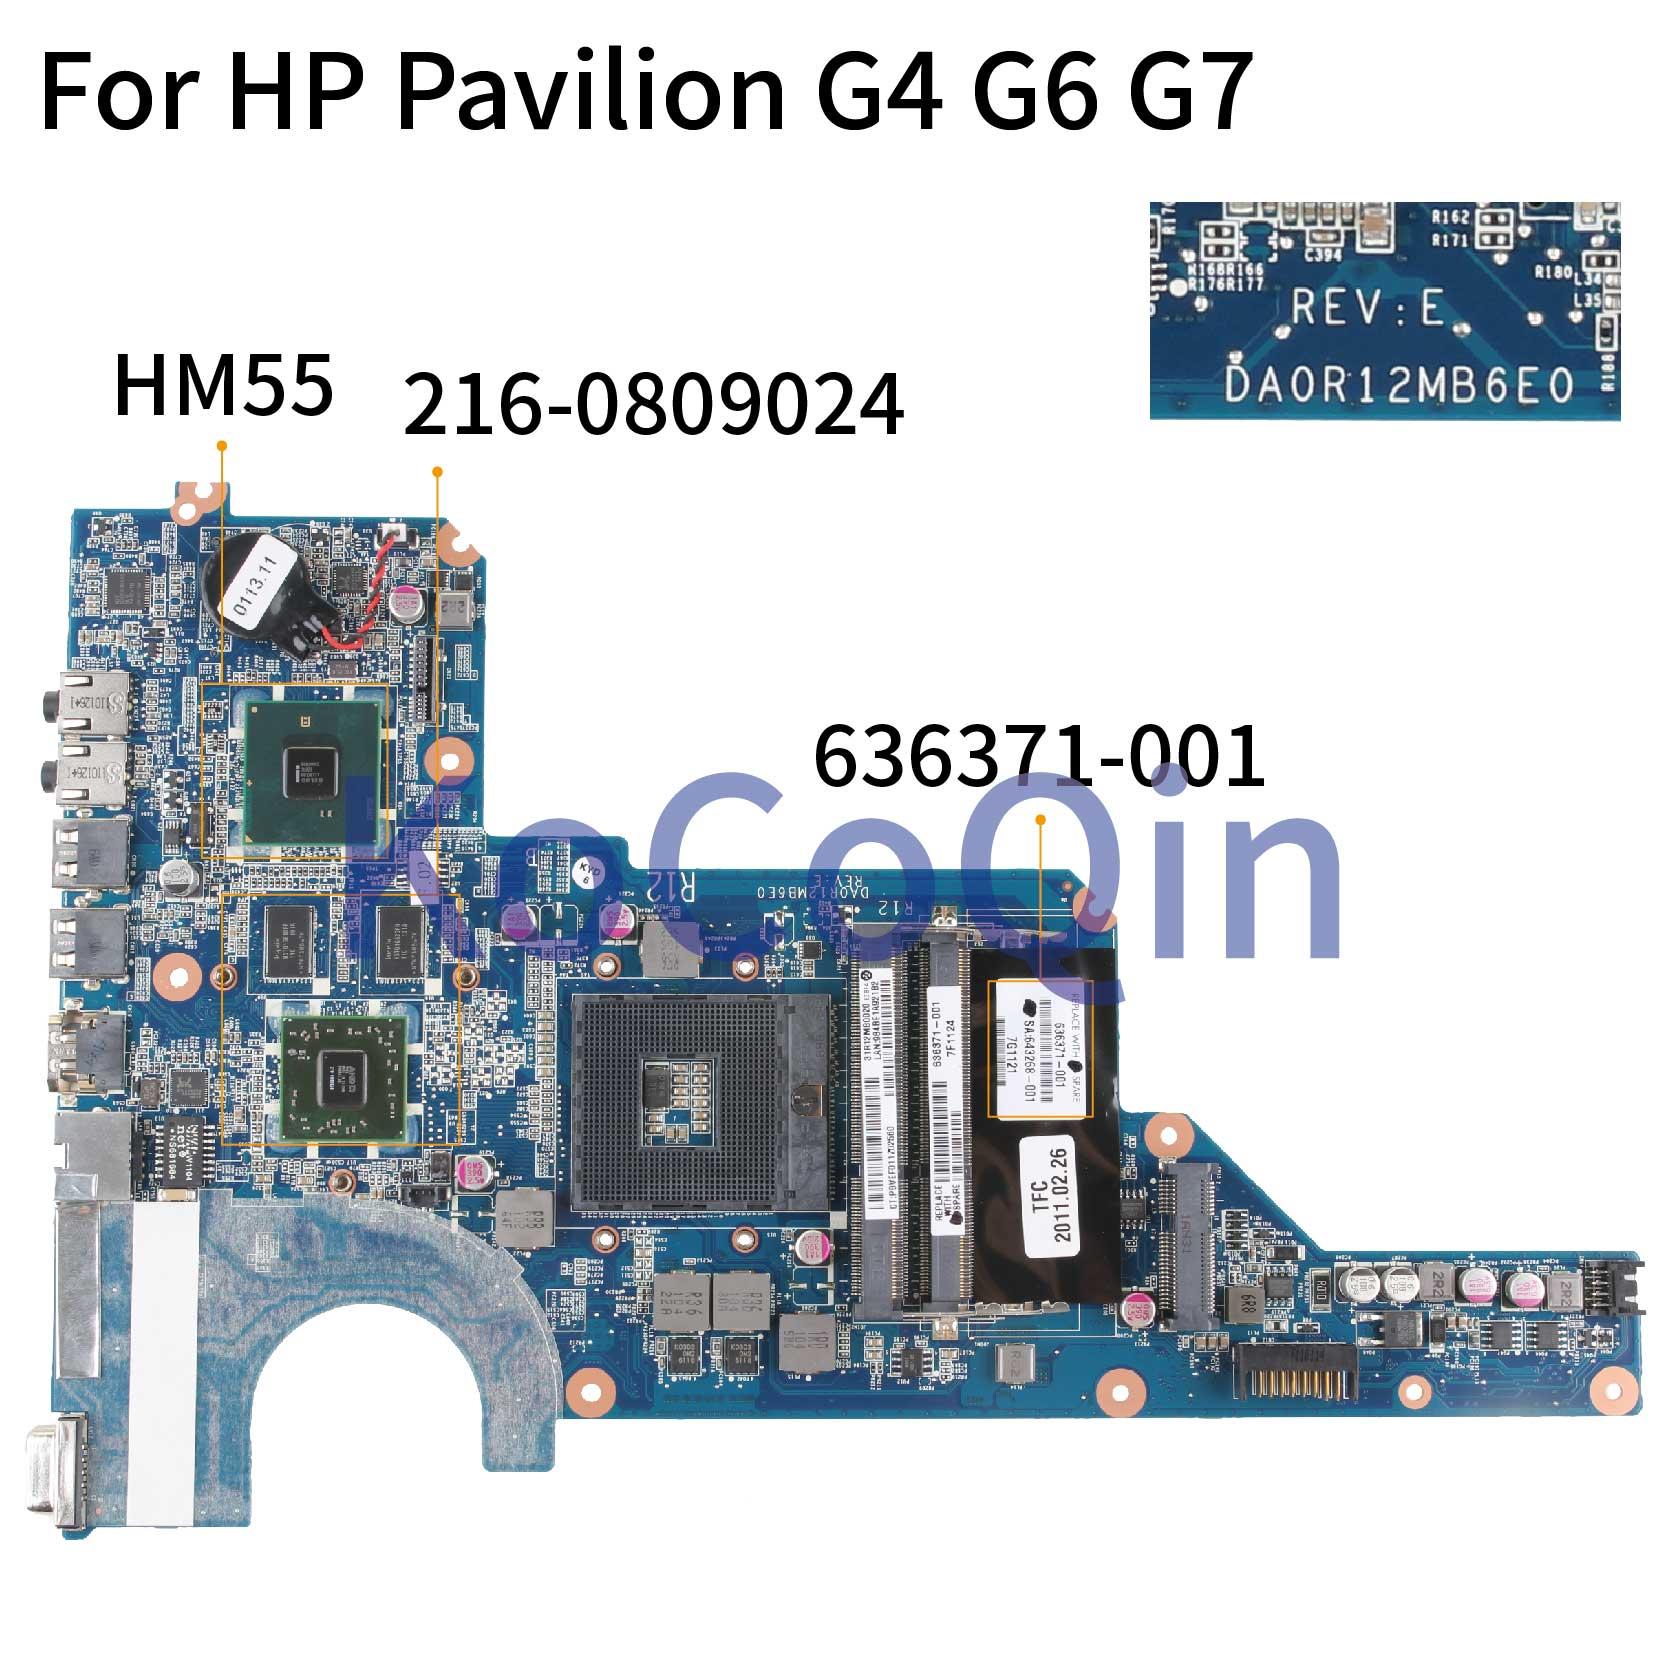 KoCoQin Laptop Motherboard For HP Pavilion G4 G4-1000 G6-1000 G7 Mainboard 636371-001 636371-501 HM55 DA0R12MB6E0 216-0809024